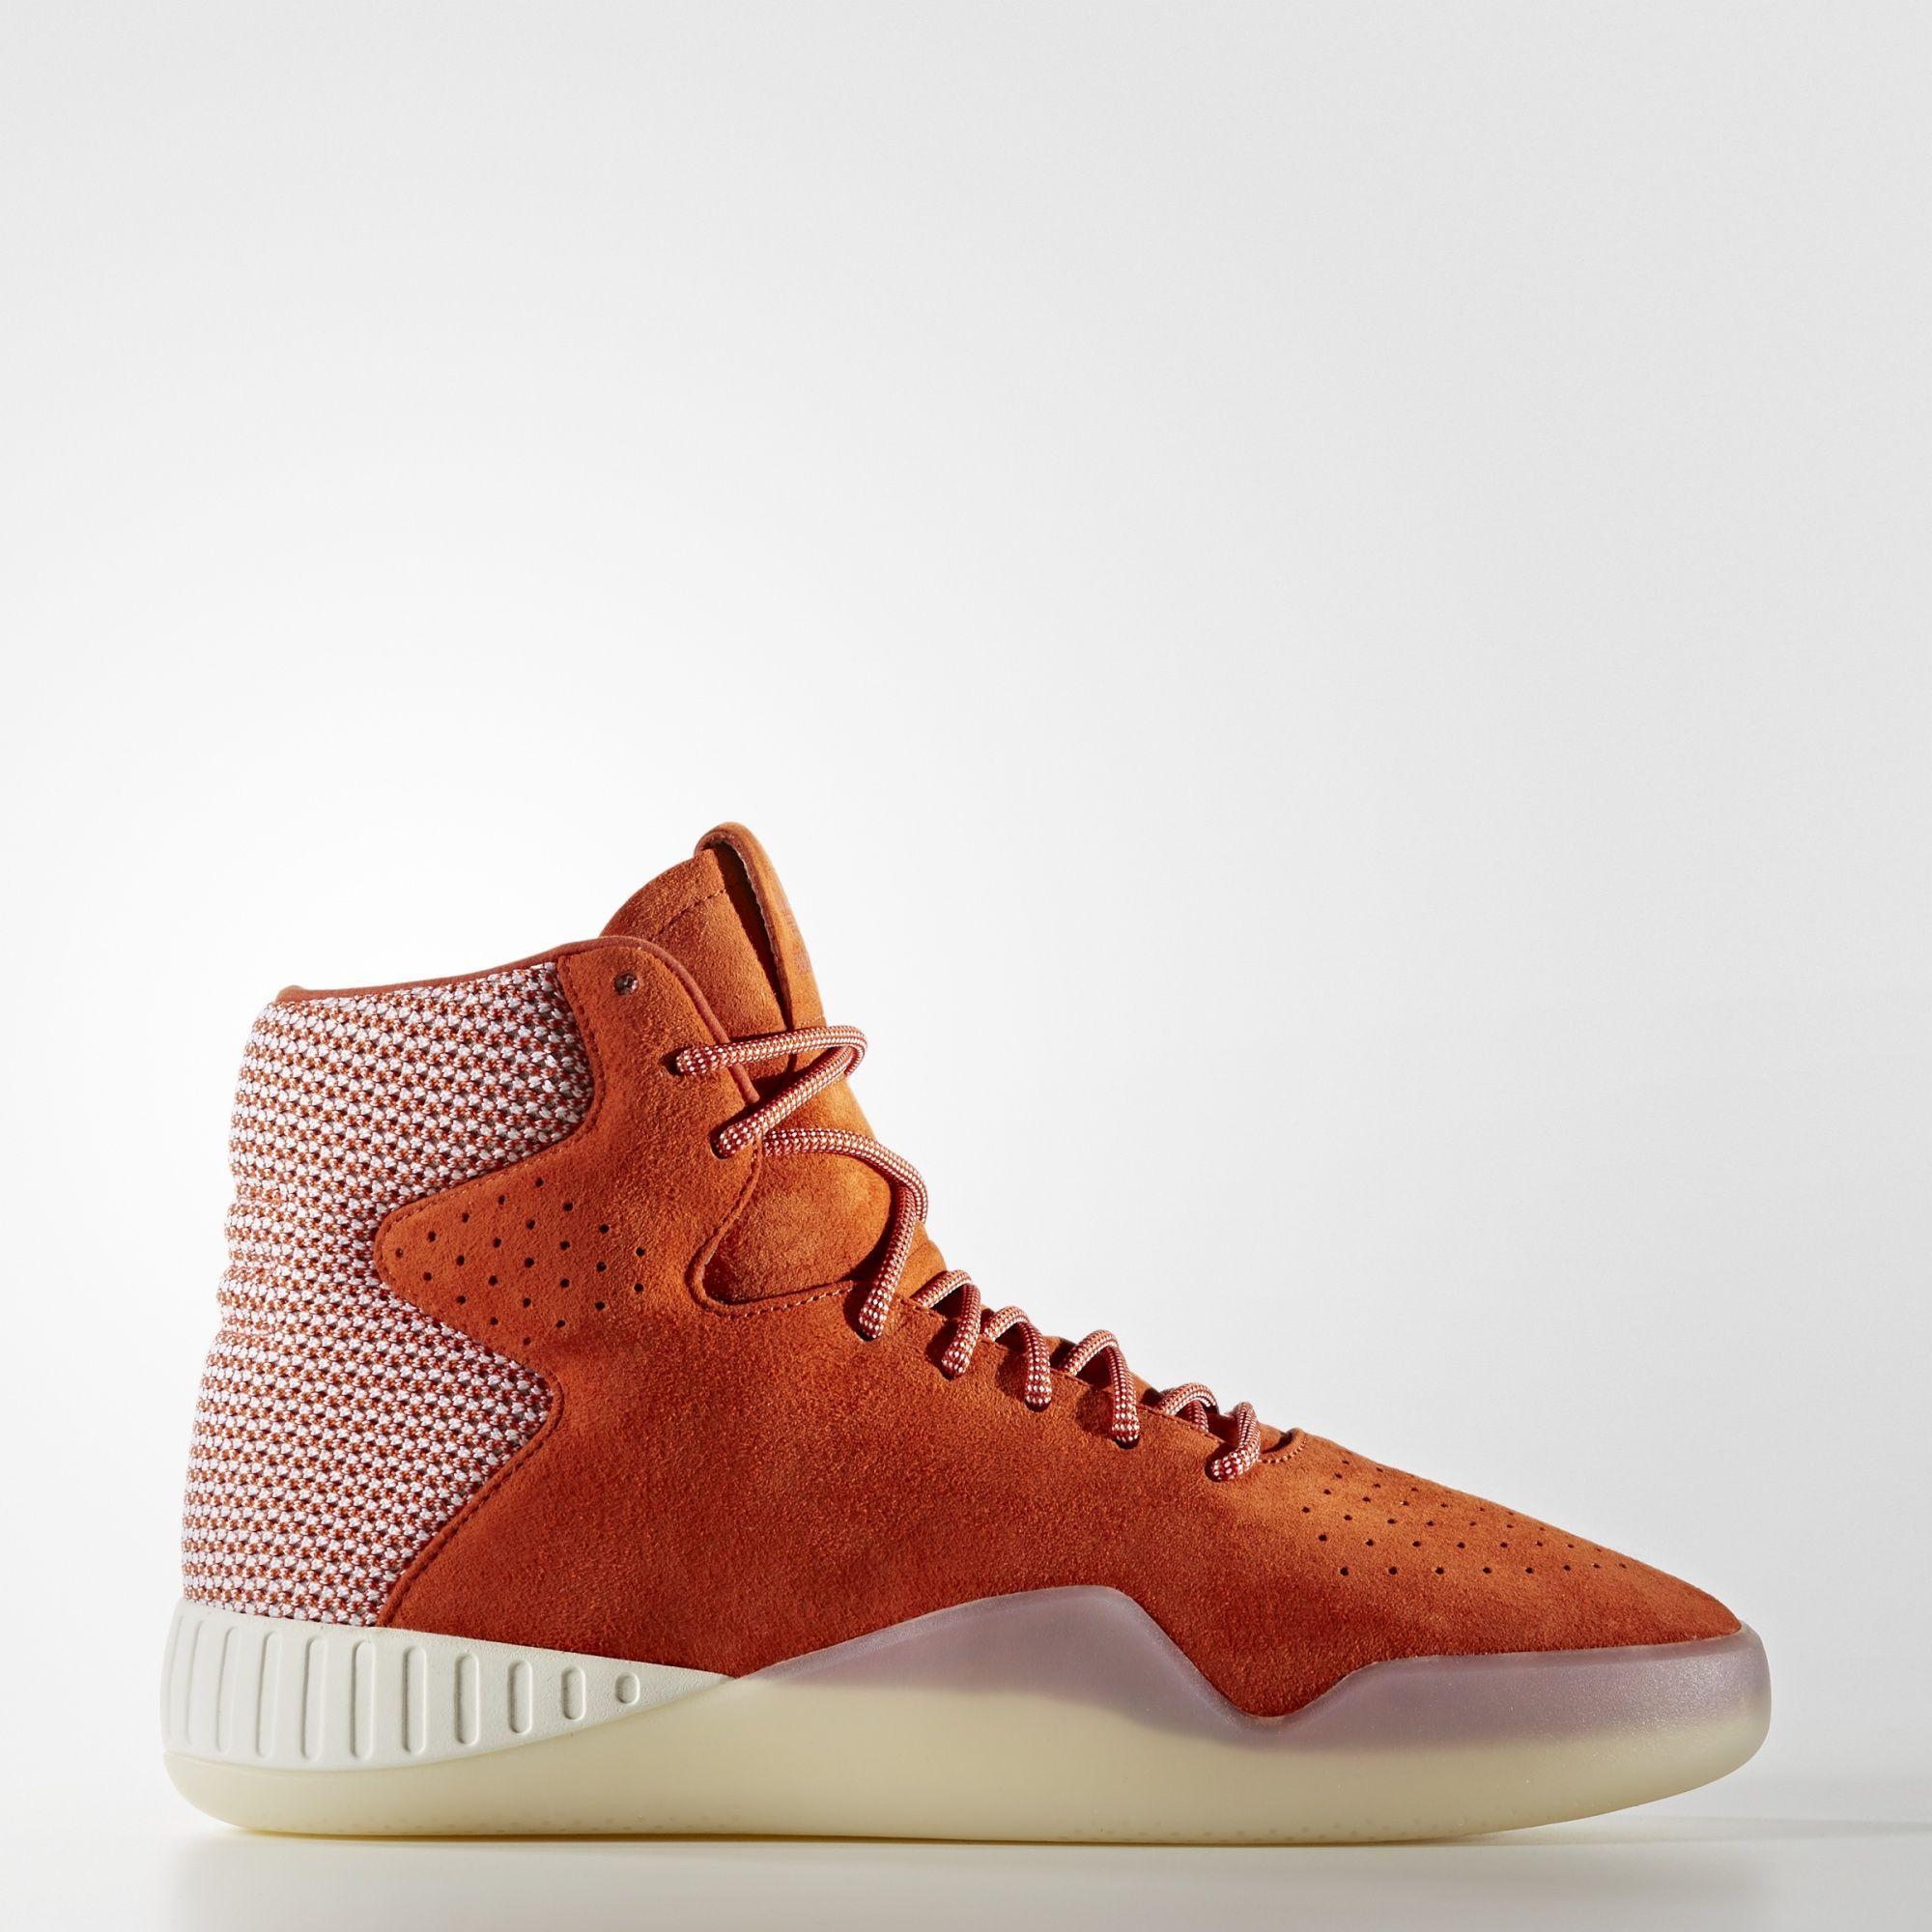 adidas per istinto le scarpe pinterest tubulare scarpe